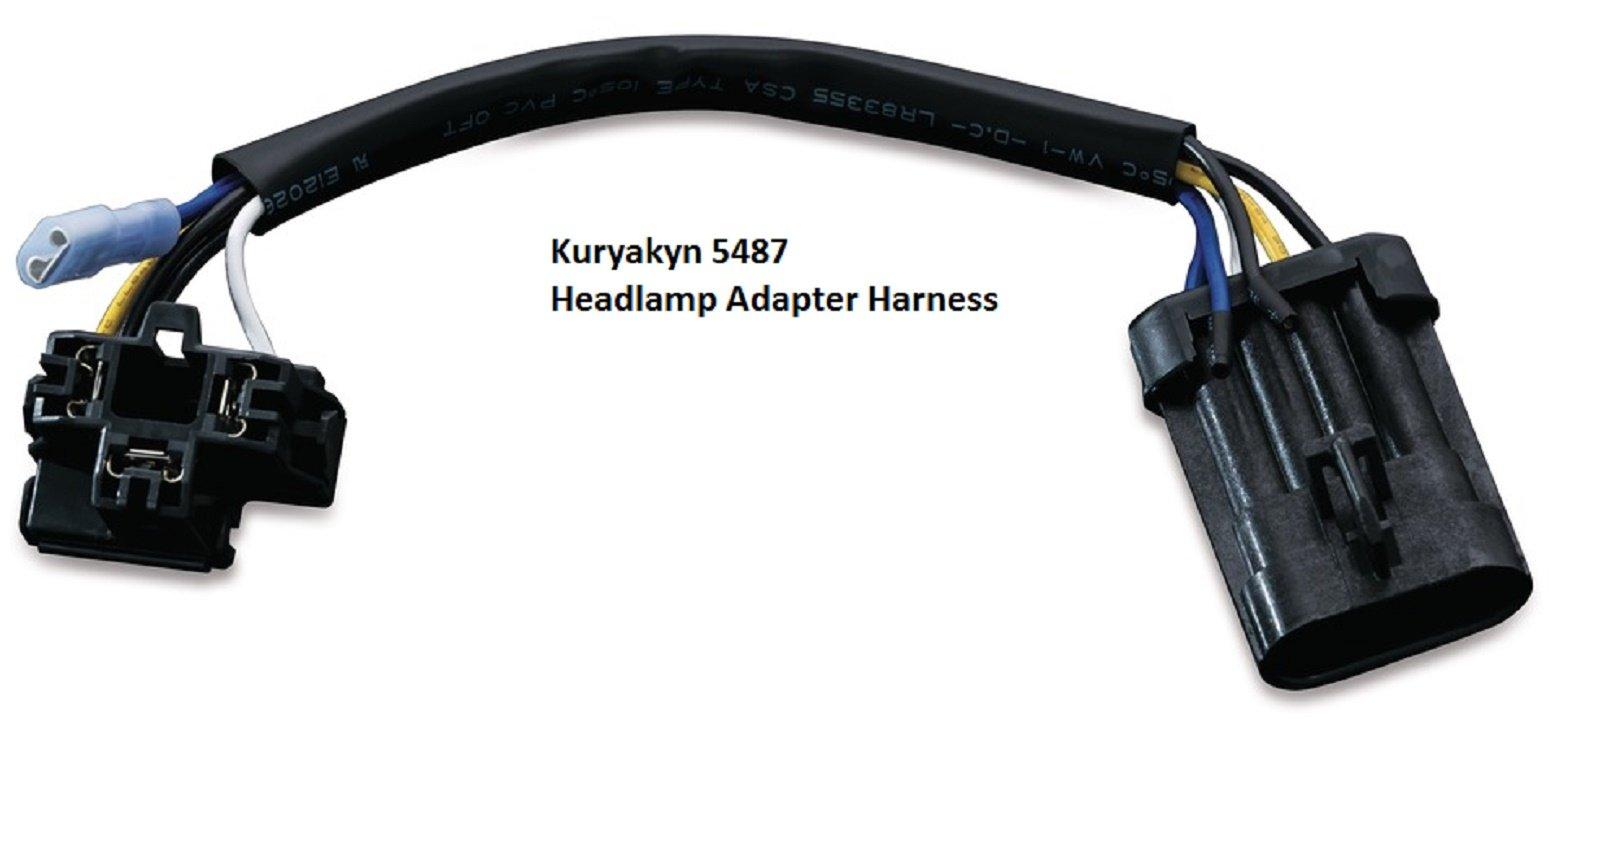 Kuryakyn 5487 Headlamp Adapter Harness by Kuryakyn (Image #2)